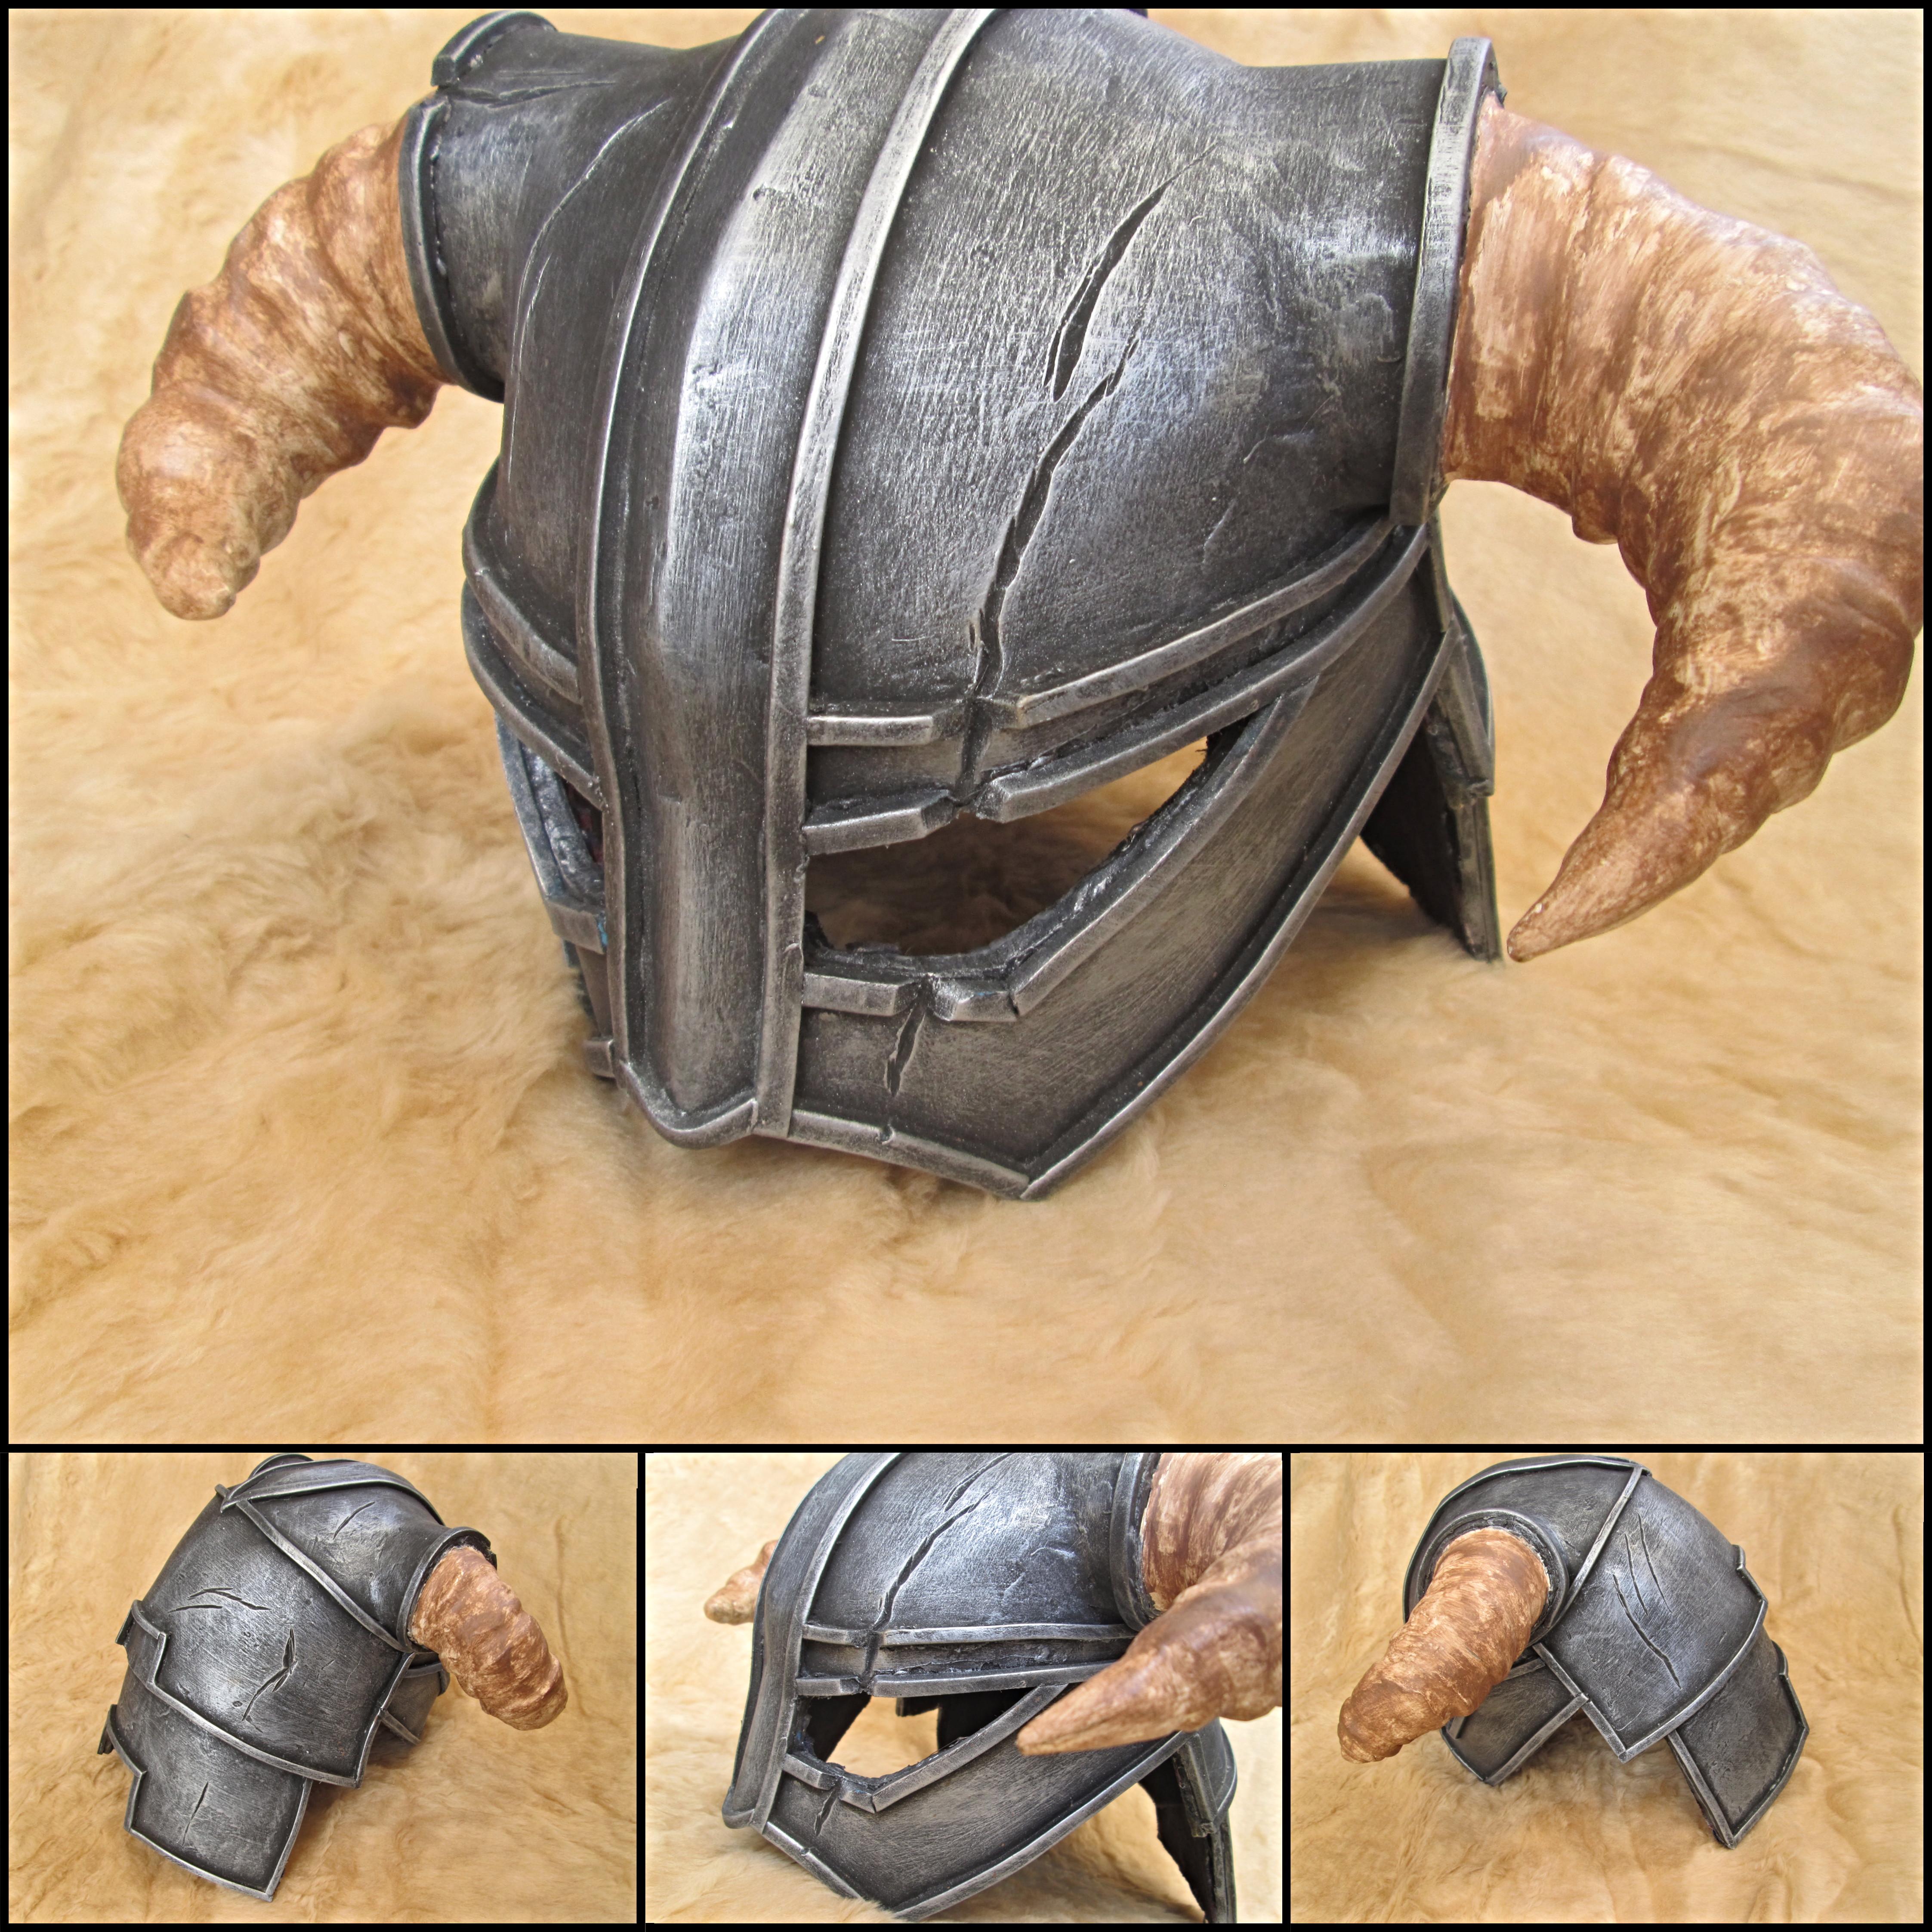 Skyrim iron helmet by josuaartdesigns on deviantart skyrim iron helmet by josuaartdesigns skyrim iron helmet by josuaartdesigns pronofoot35fo Image collections